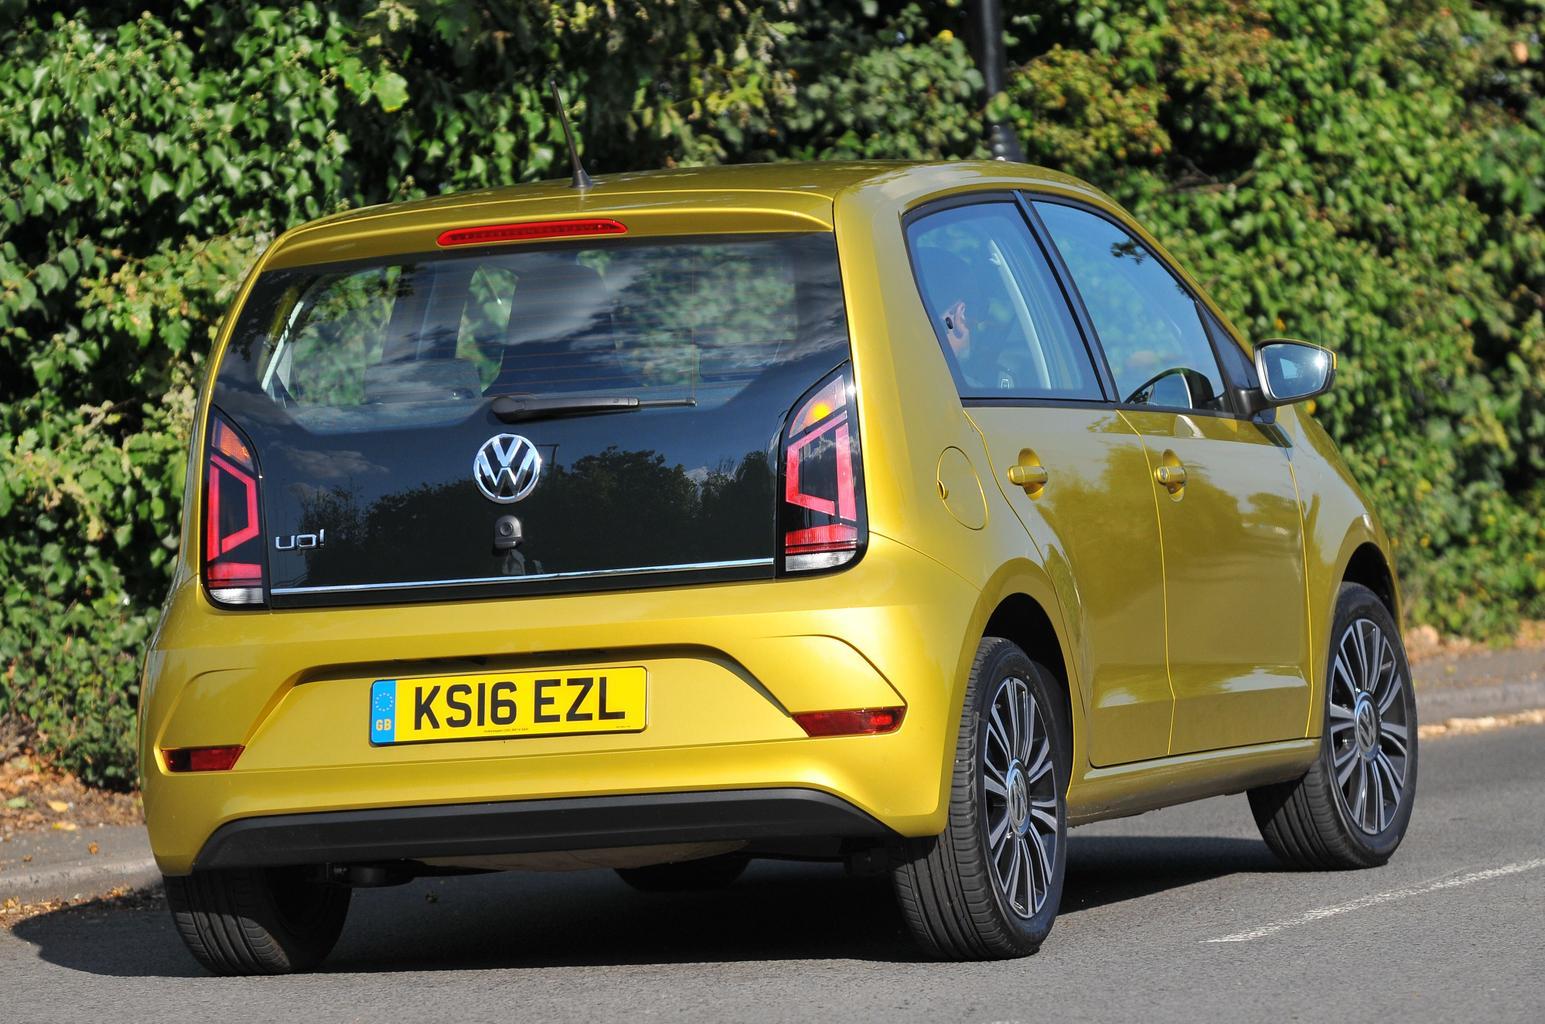 New Volkswagen Up vs Hyundai i10 vs Renault Twingo